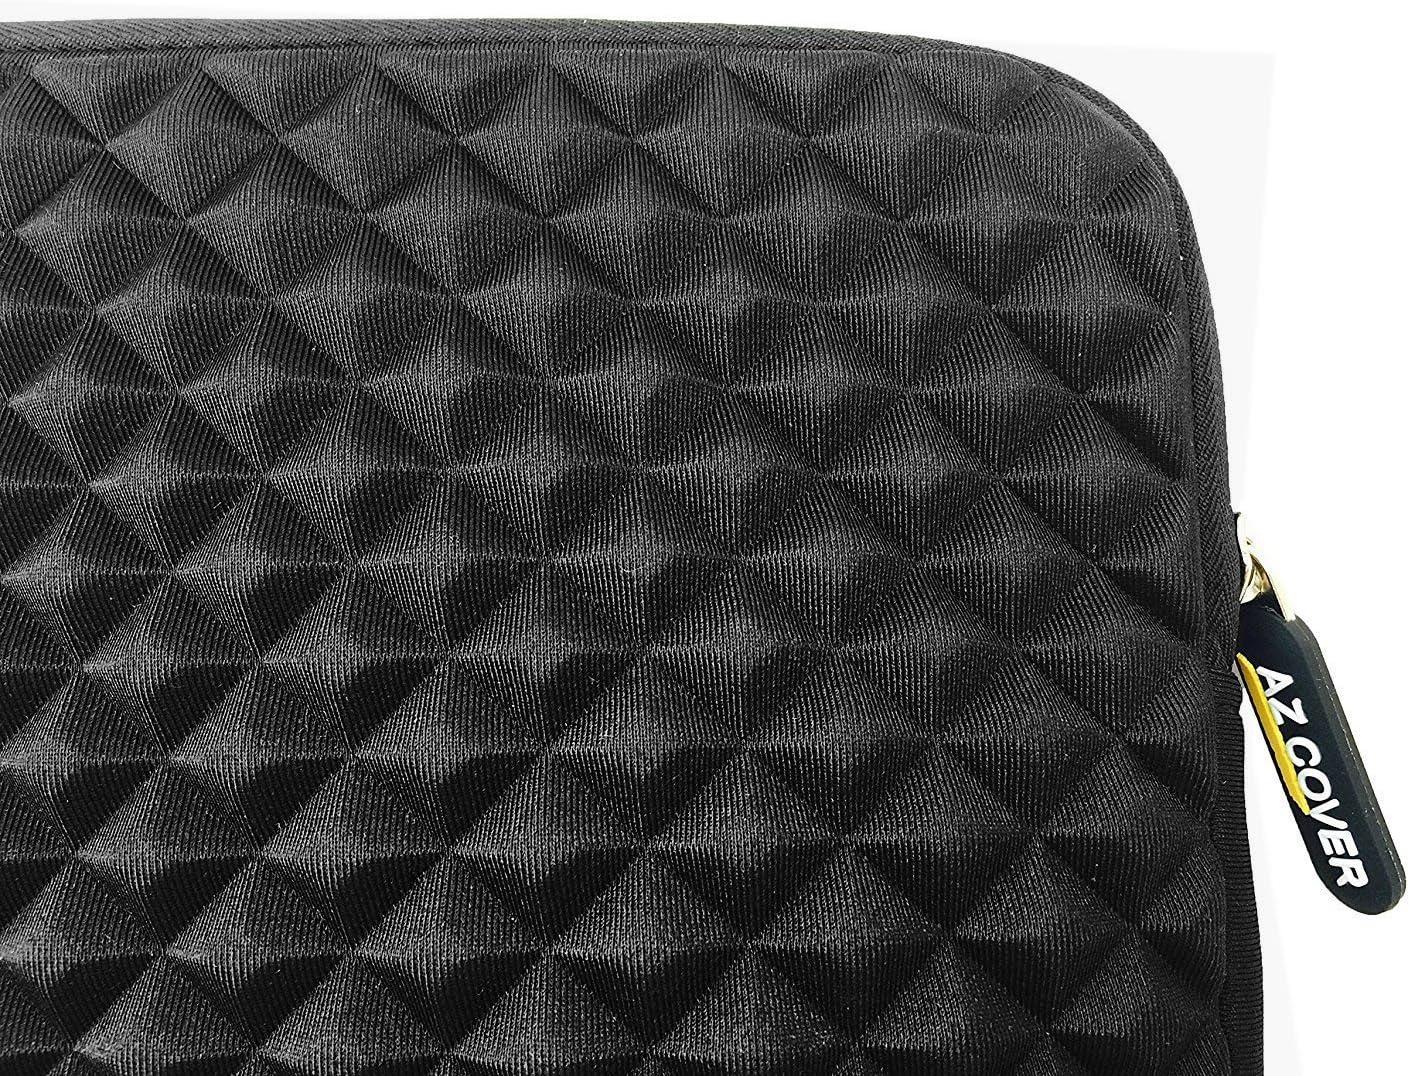 Black AZ-Cover 12.1-Inch Simplicity Stylish Diamond Foam Shock-Resistant Neoprene Sleeve For HP EliteBook 2540p Notebook PC Intel Core i5-M540